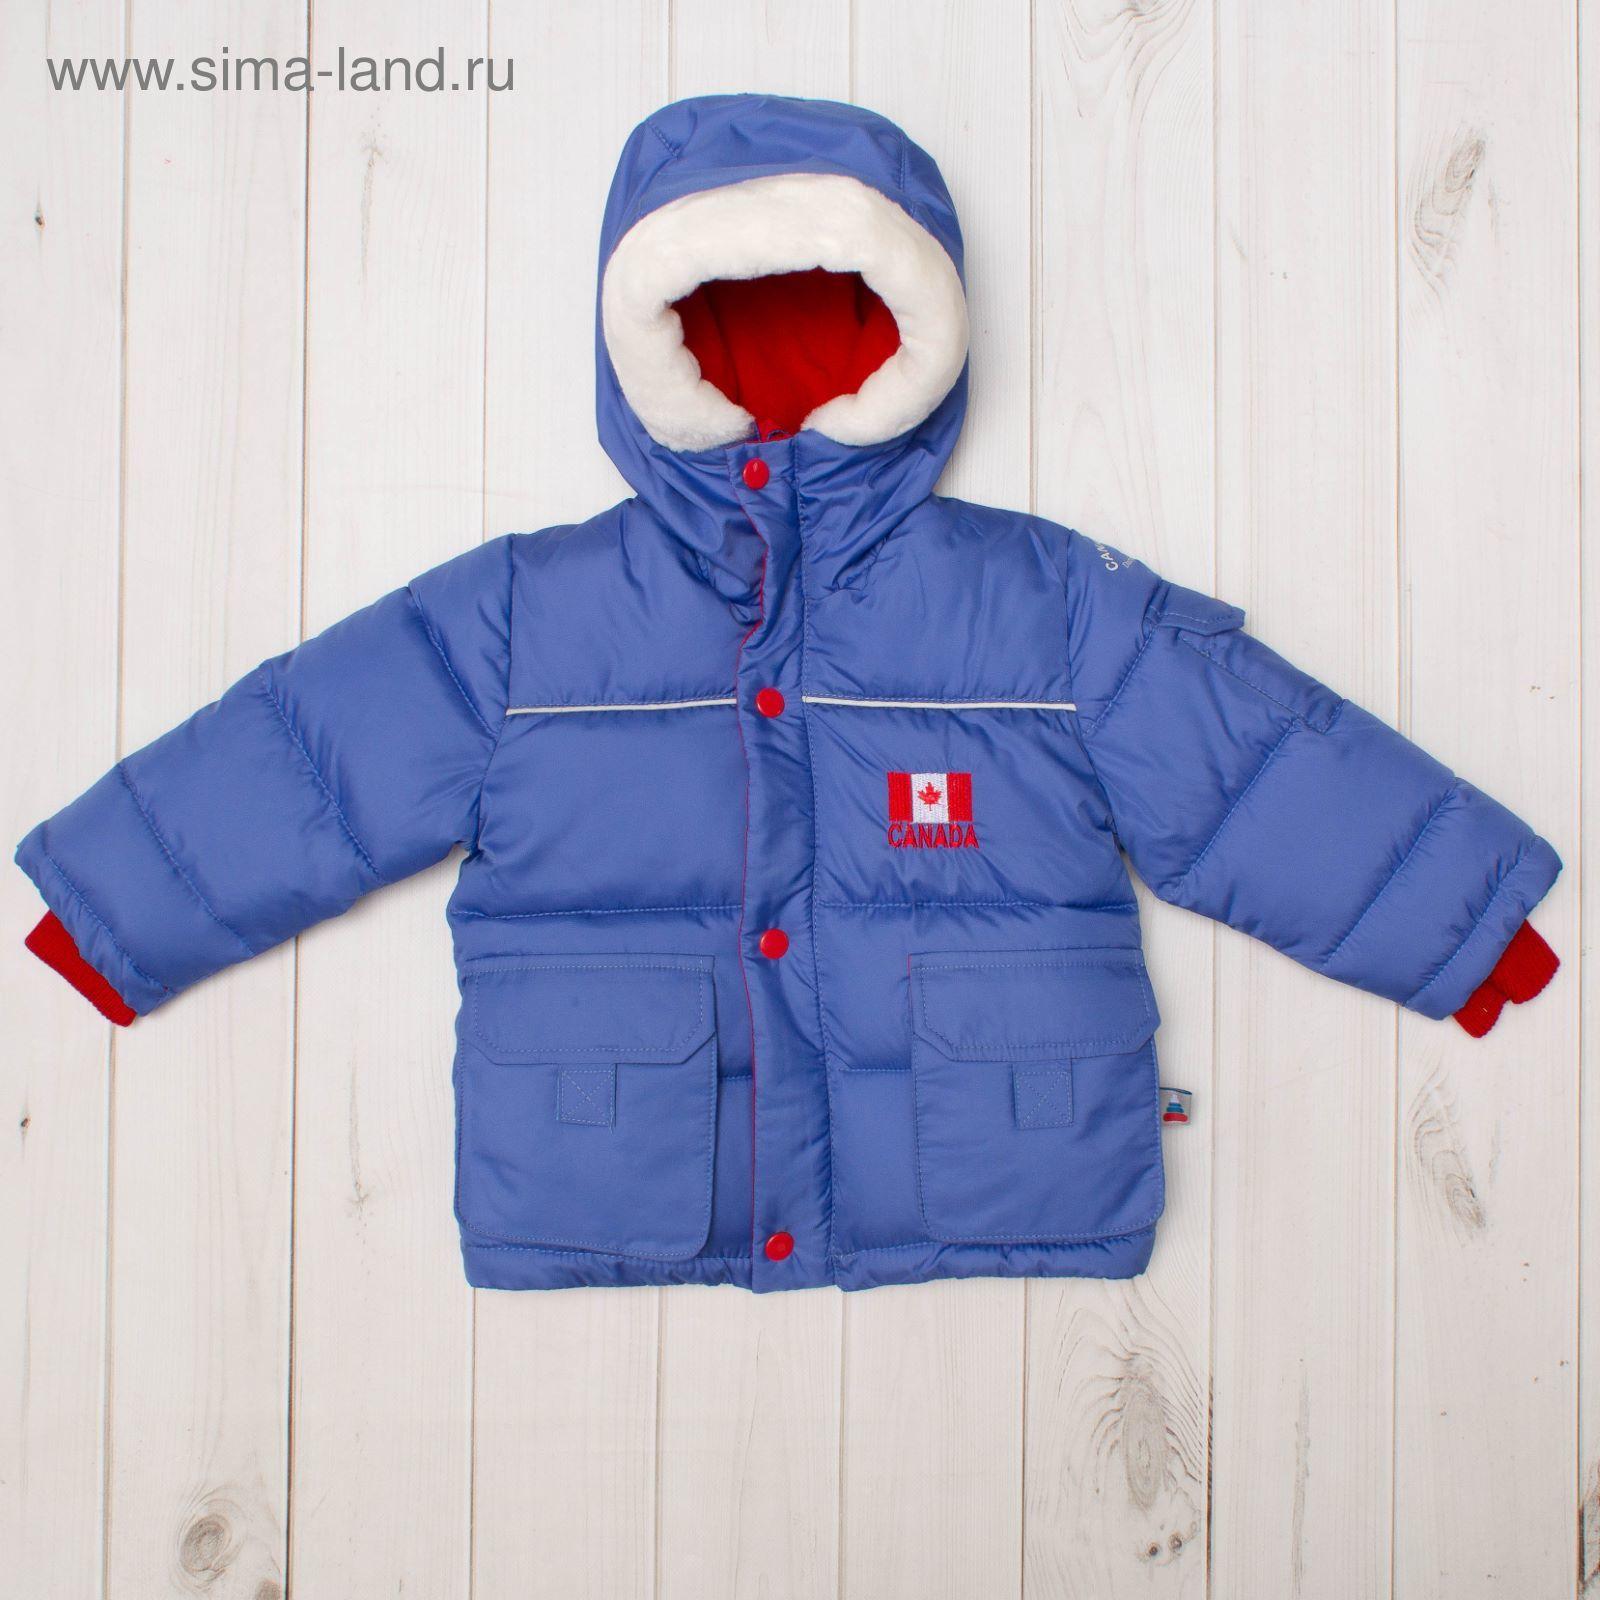 Куртка-пуховик детская «Канада» 889246059b775